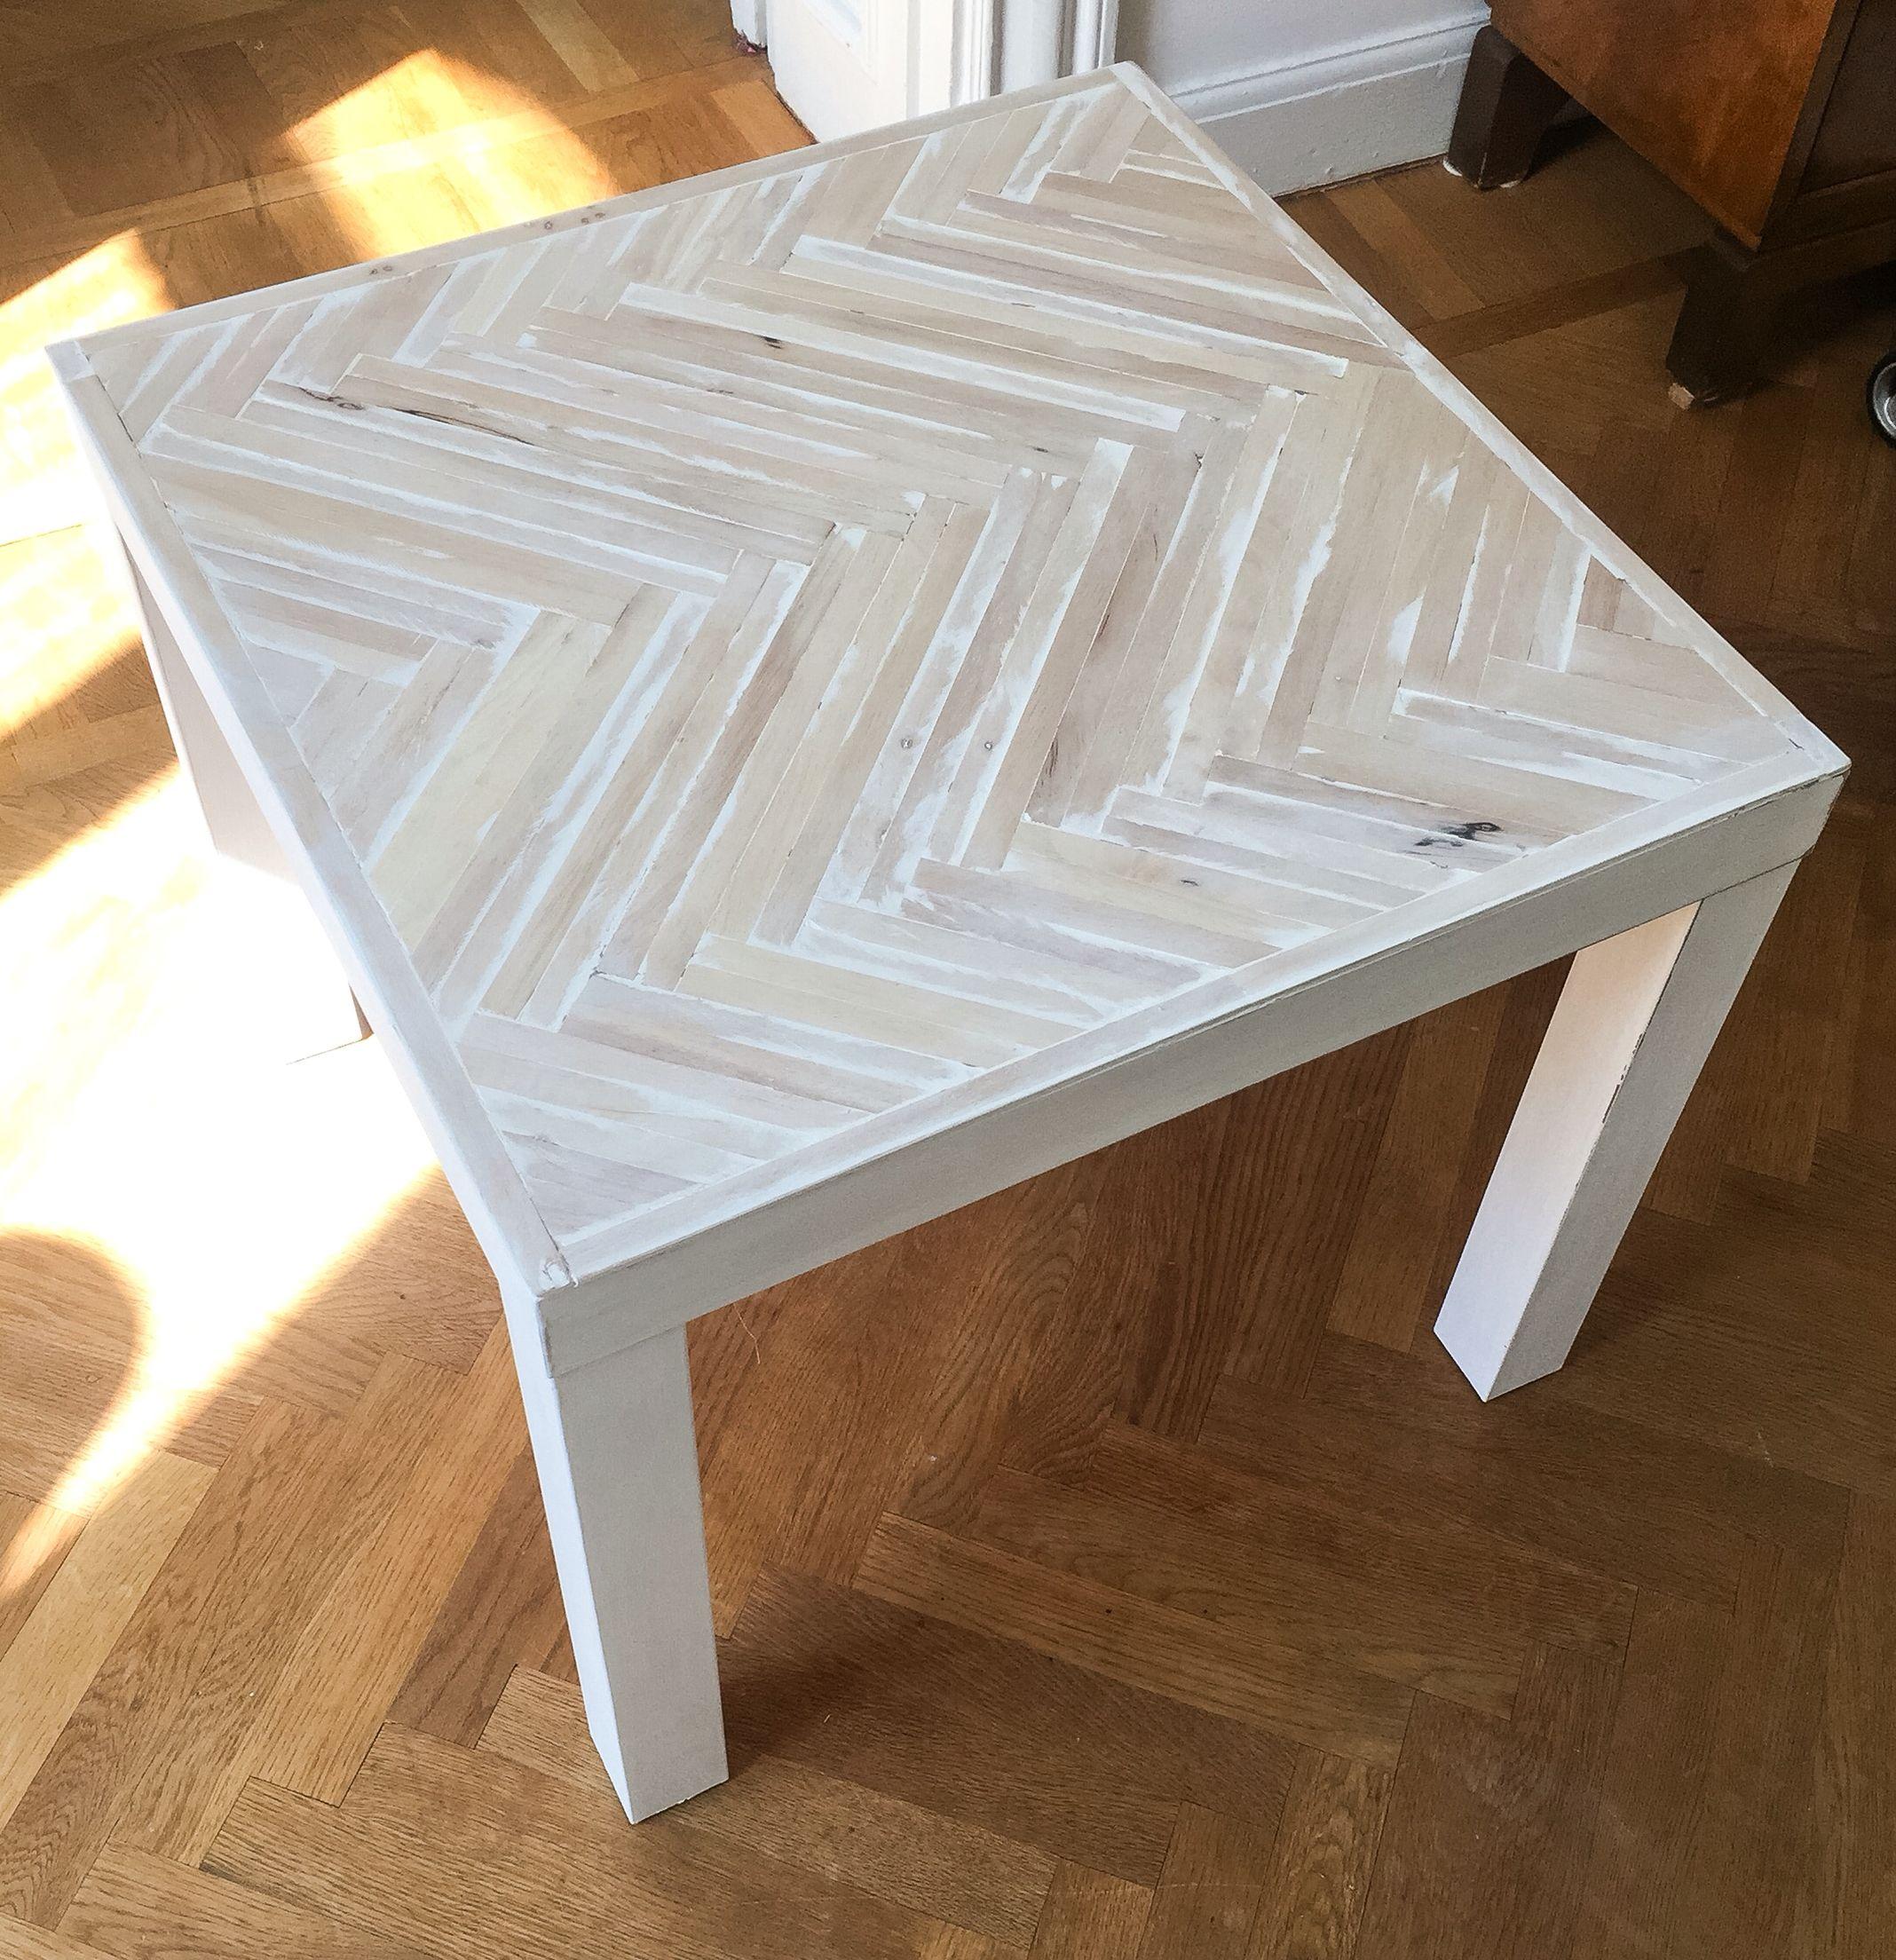 Ikea lack hack. Fishbone table top. Authentico chalk paint #ikea